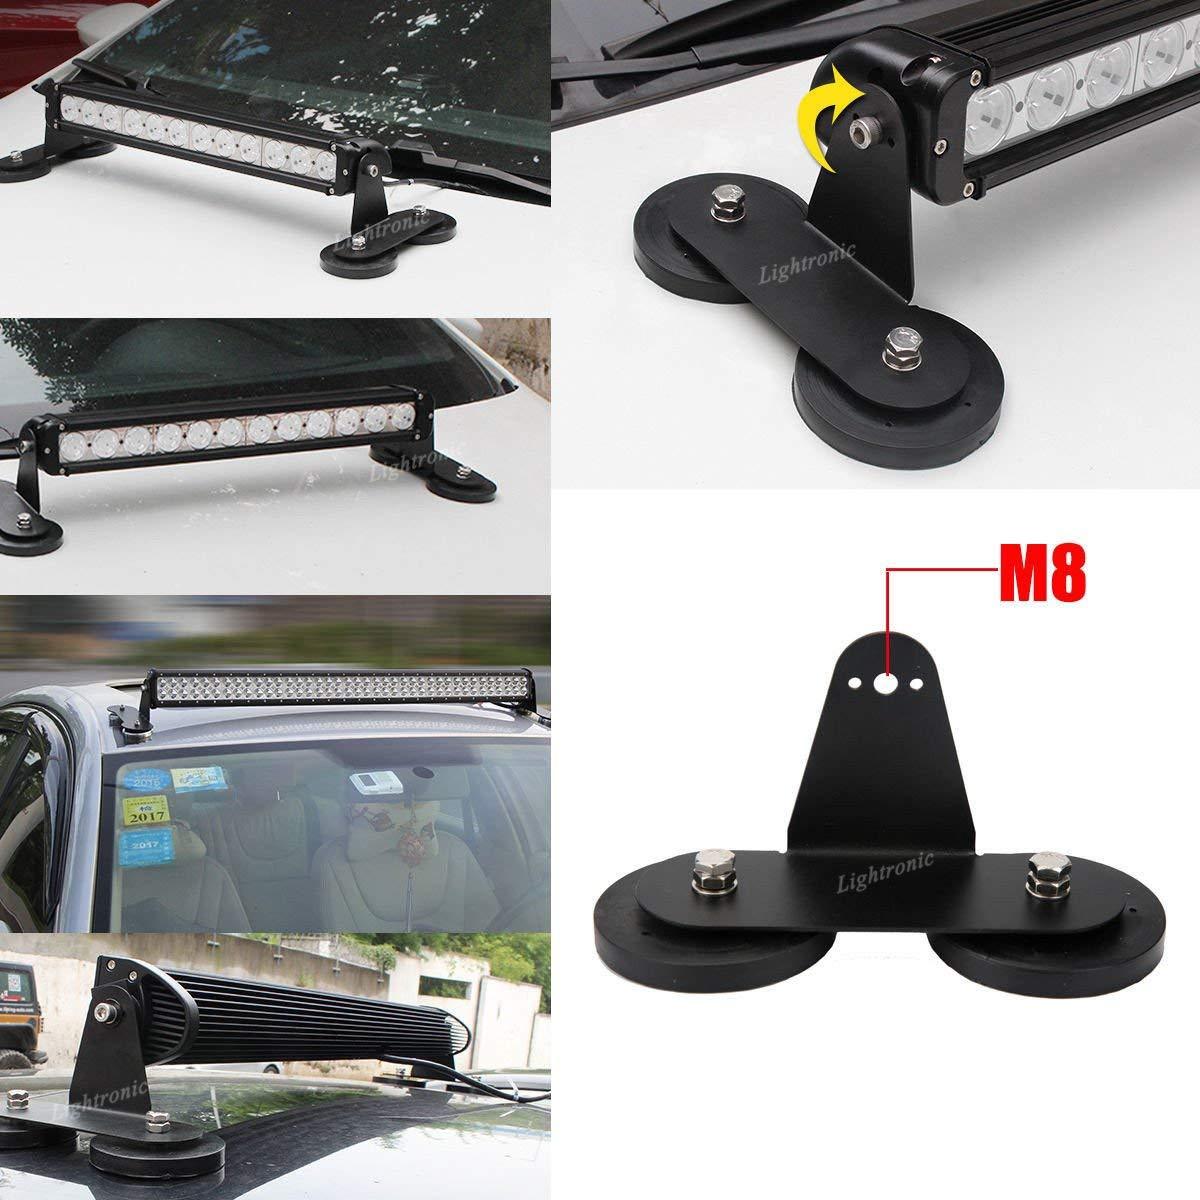 GUGUTOGO 2pcs//set Punching-free Powerful Mount Bracket Holder with Strong Magnetic Base Roof LED Light Bar for Offroad Car